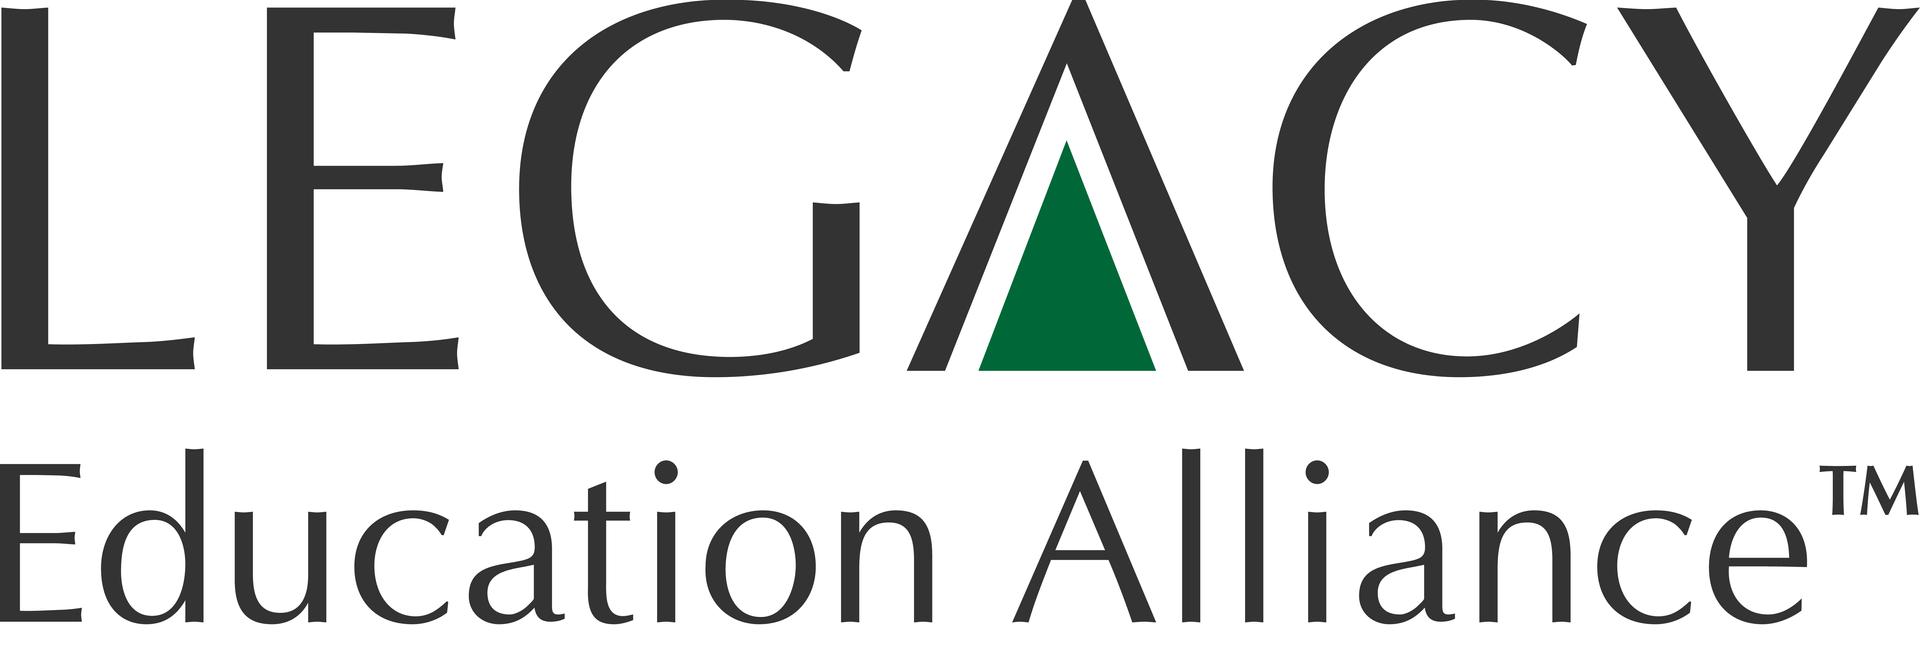 legacy-education-alliance-[logo].png